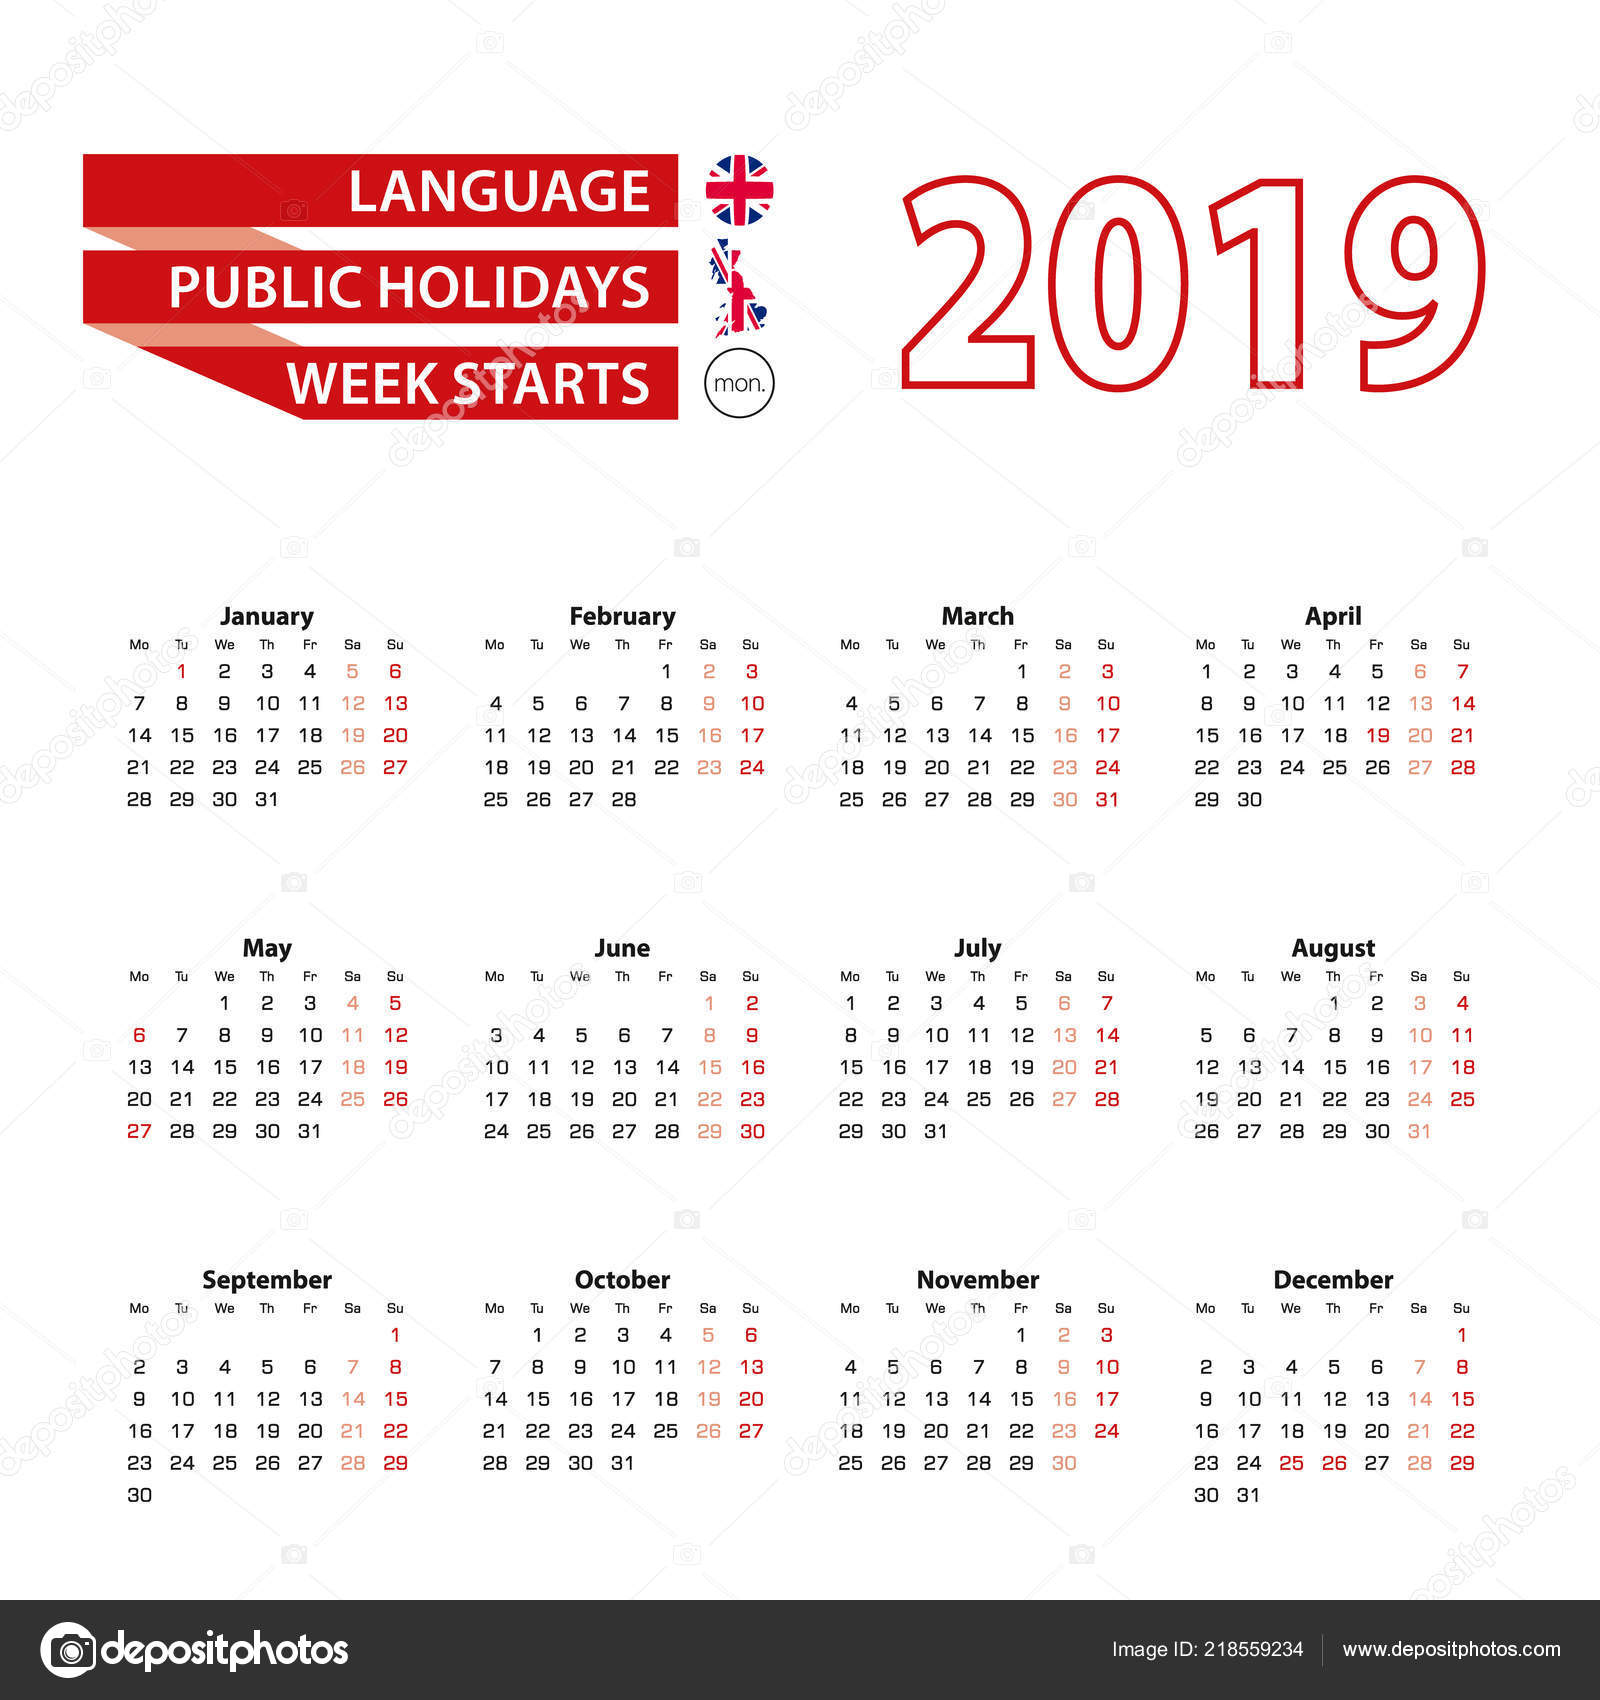 Calendario 2019 English.Calendar 2019 English Language Public Holidays United